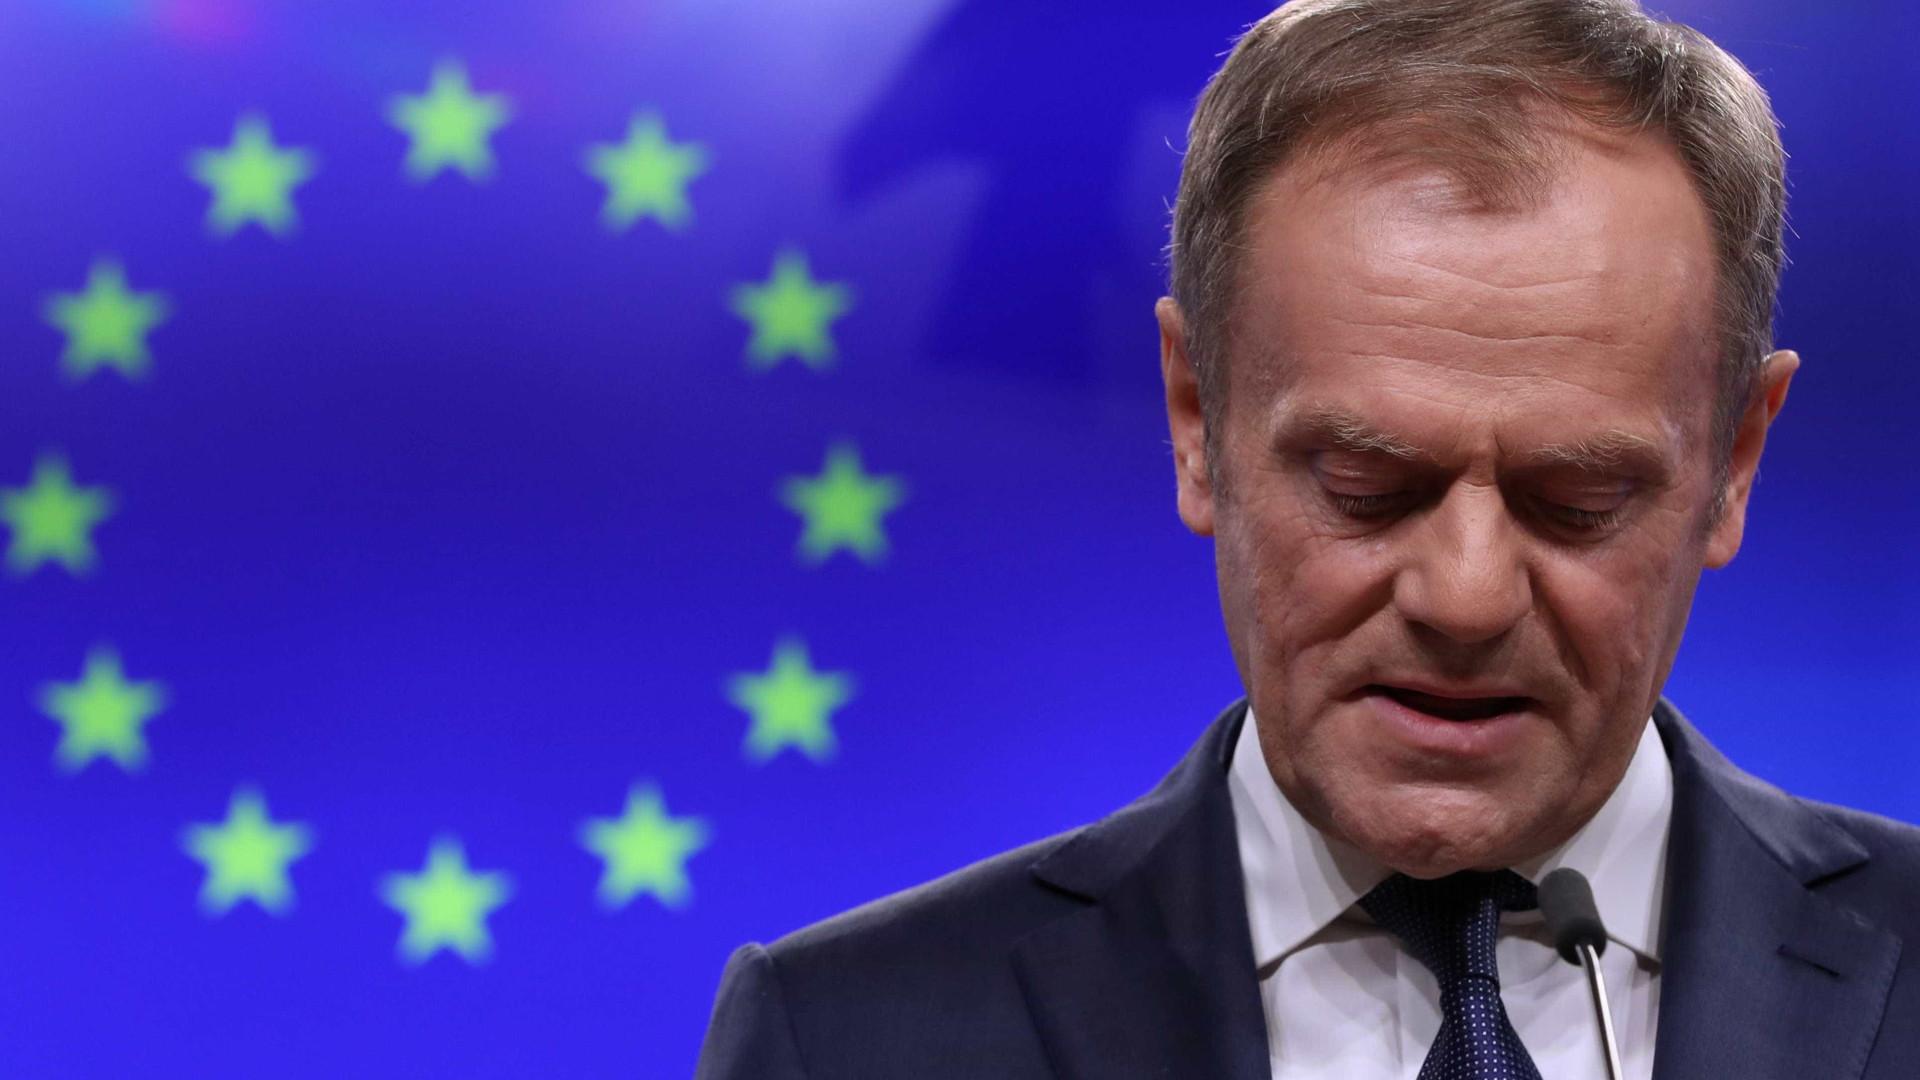 Quem defendeu Brexit tem lugar no inferno, diz líder europeu